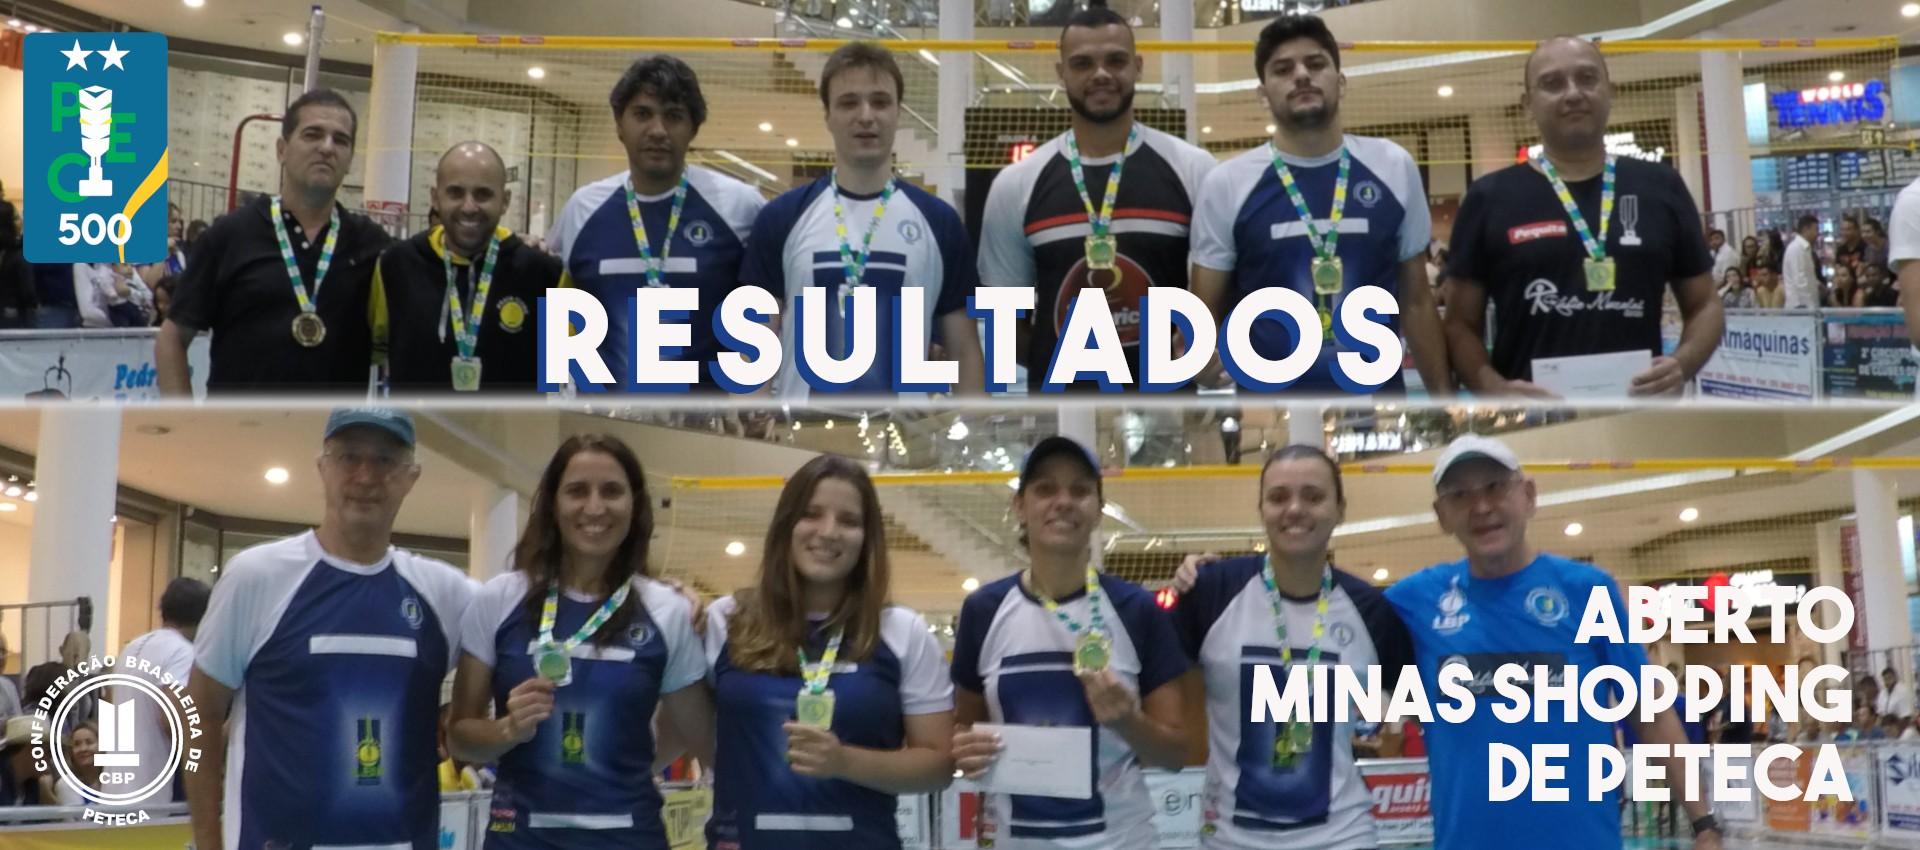 Resultados do Aberto Minas Shopping de Peteca